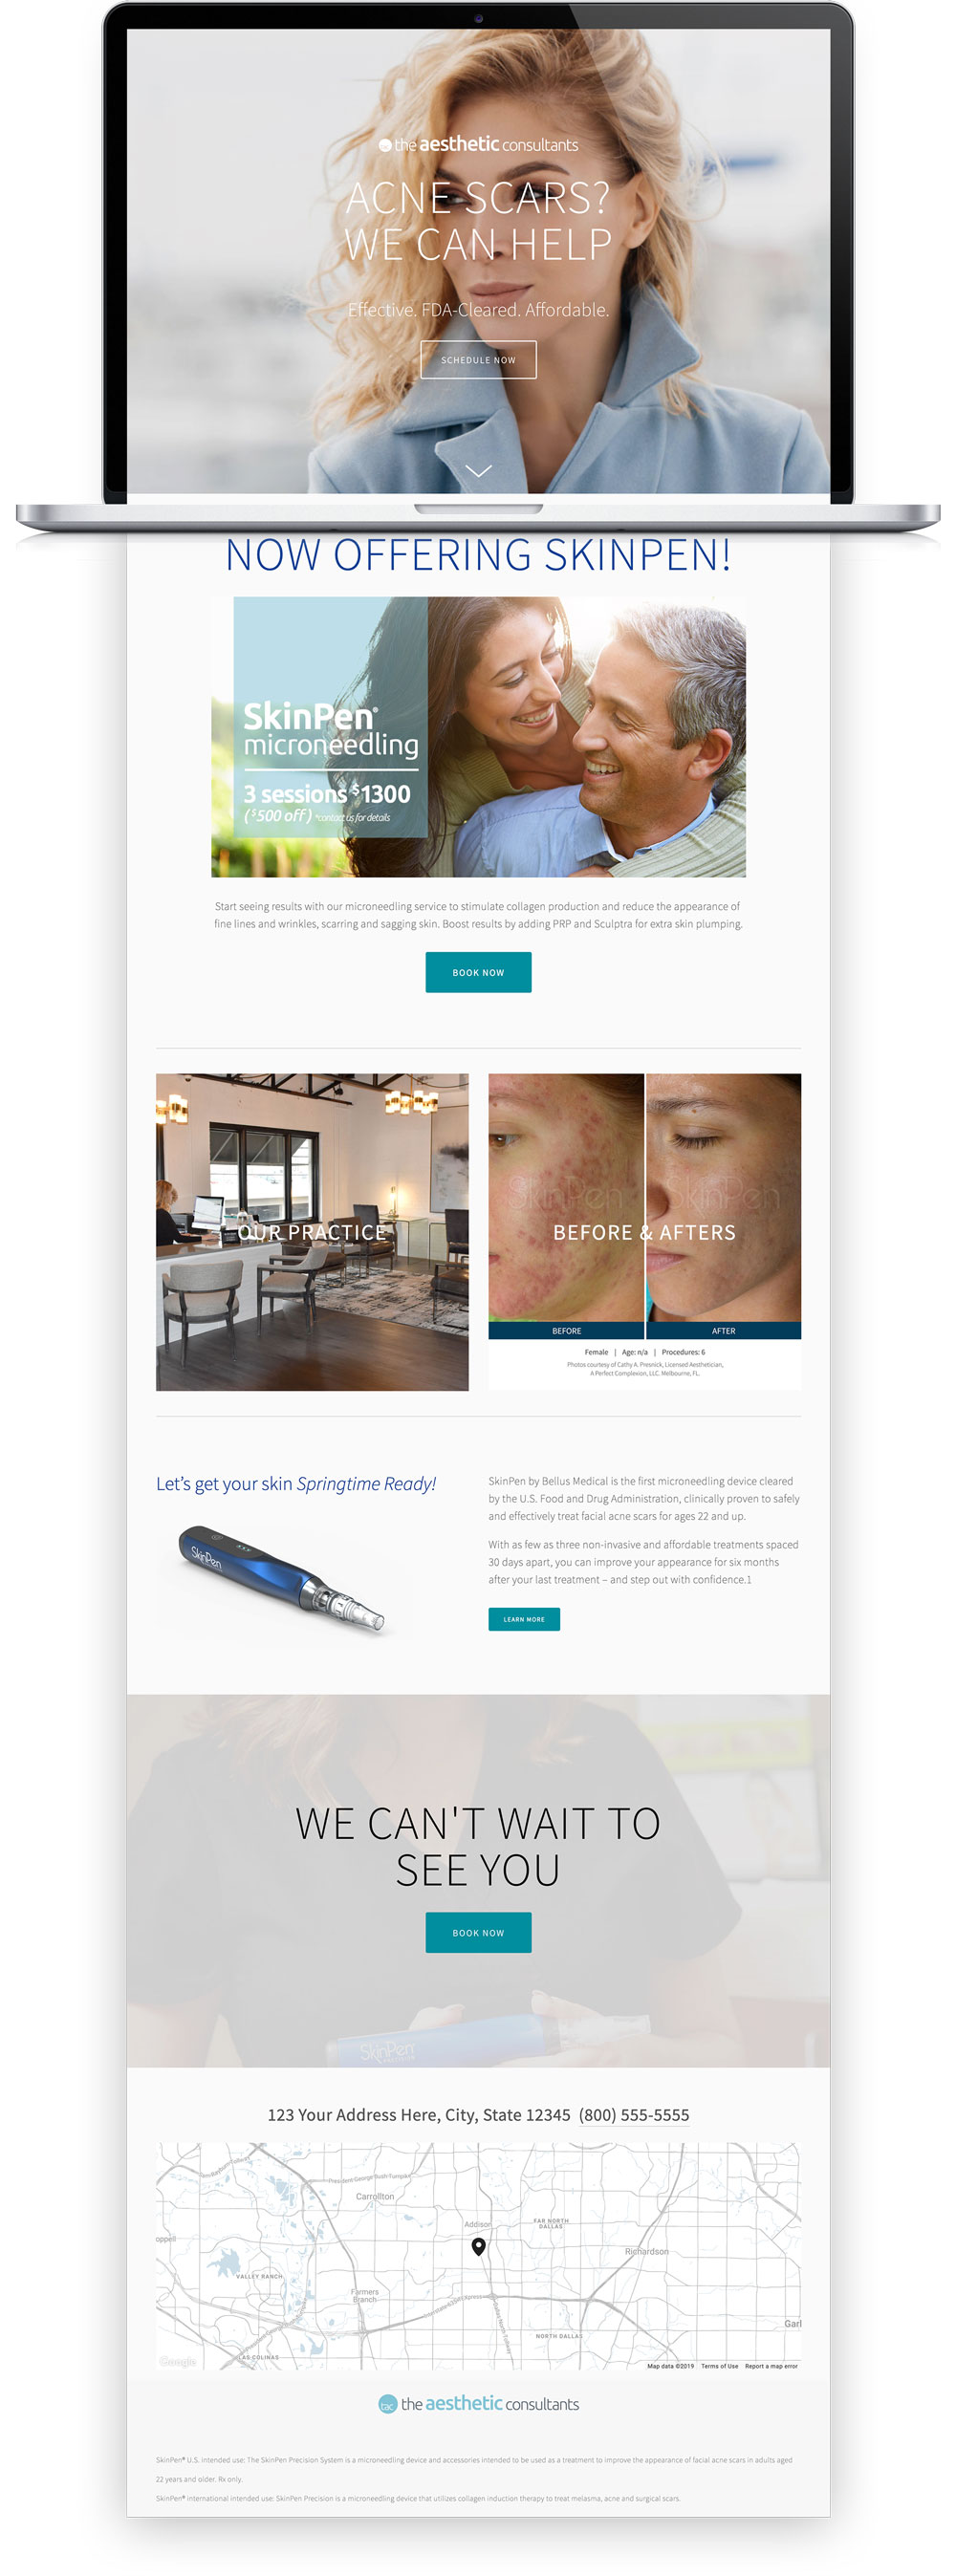 microneedling-web-page-mockup.jpg